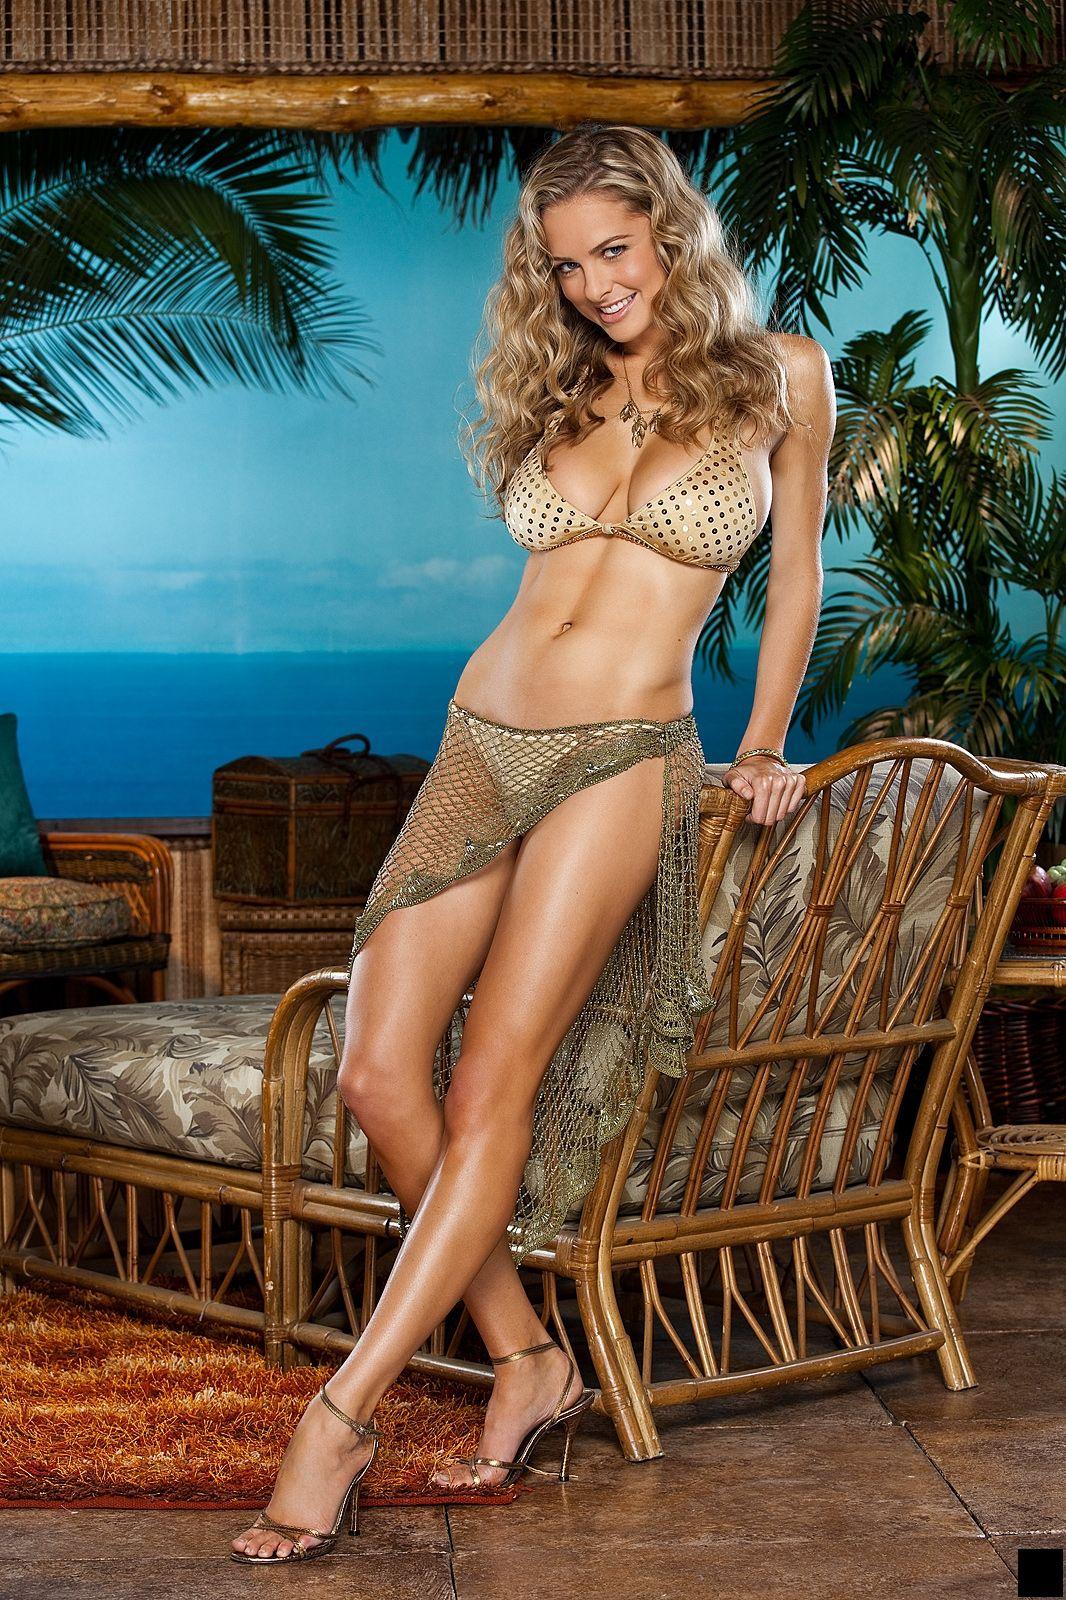 Pussy Sexy Shanna McLaughlin naked photo 2017